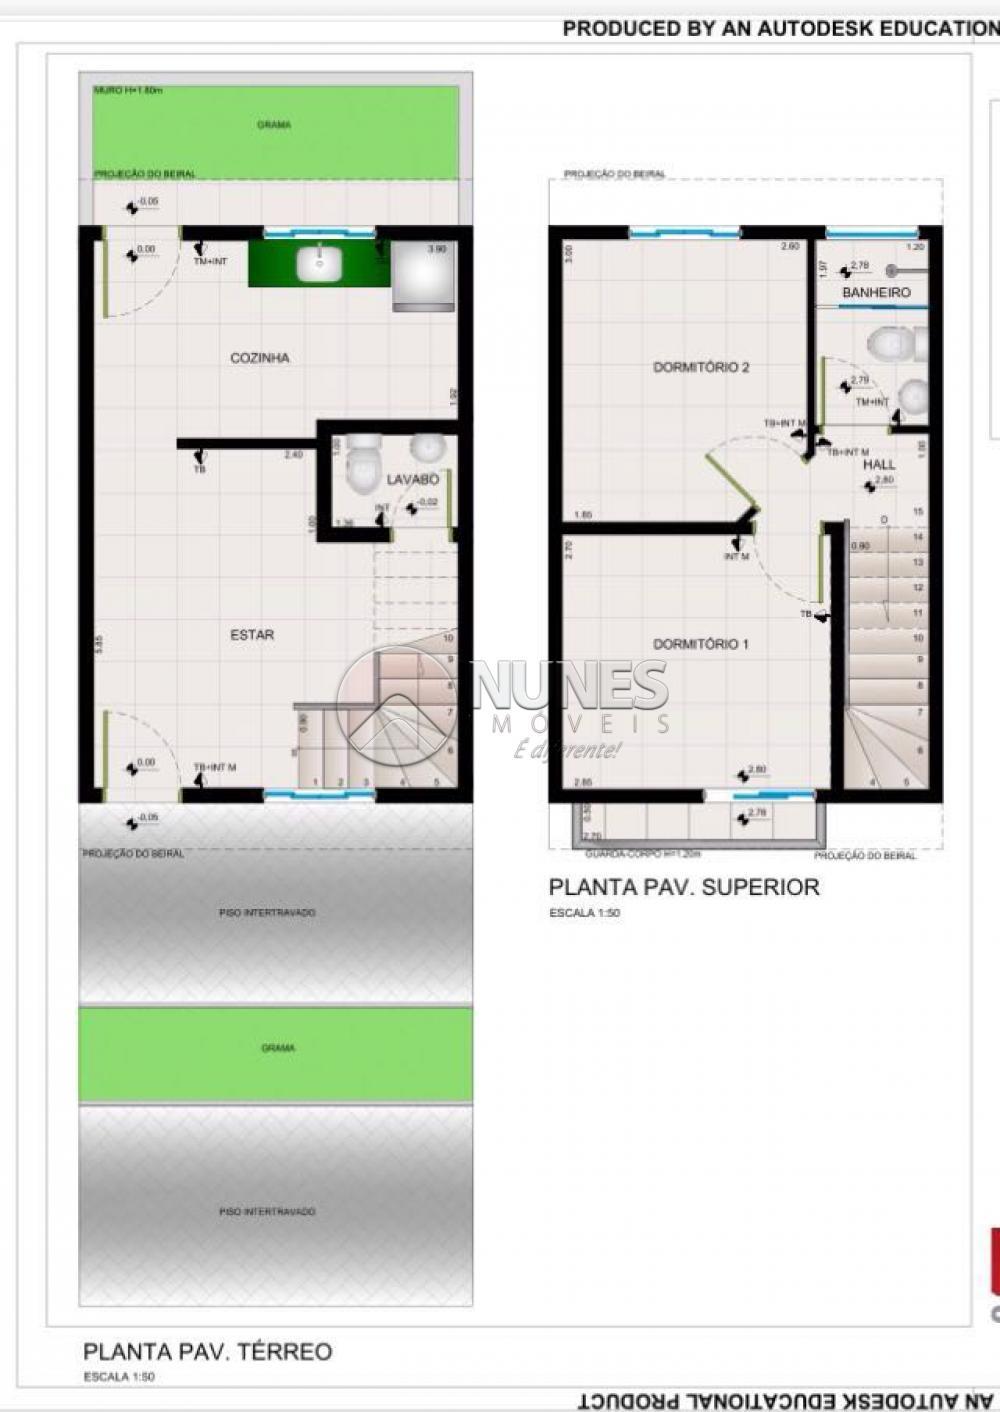 Casa De Condominio de 2 dormitórios à venda em Recanto Feliz, Francisco Morato - SP